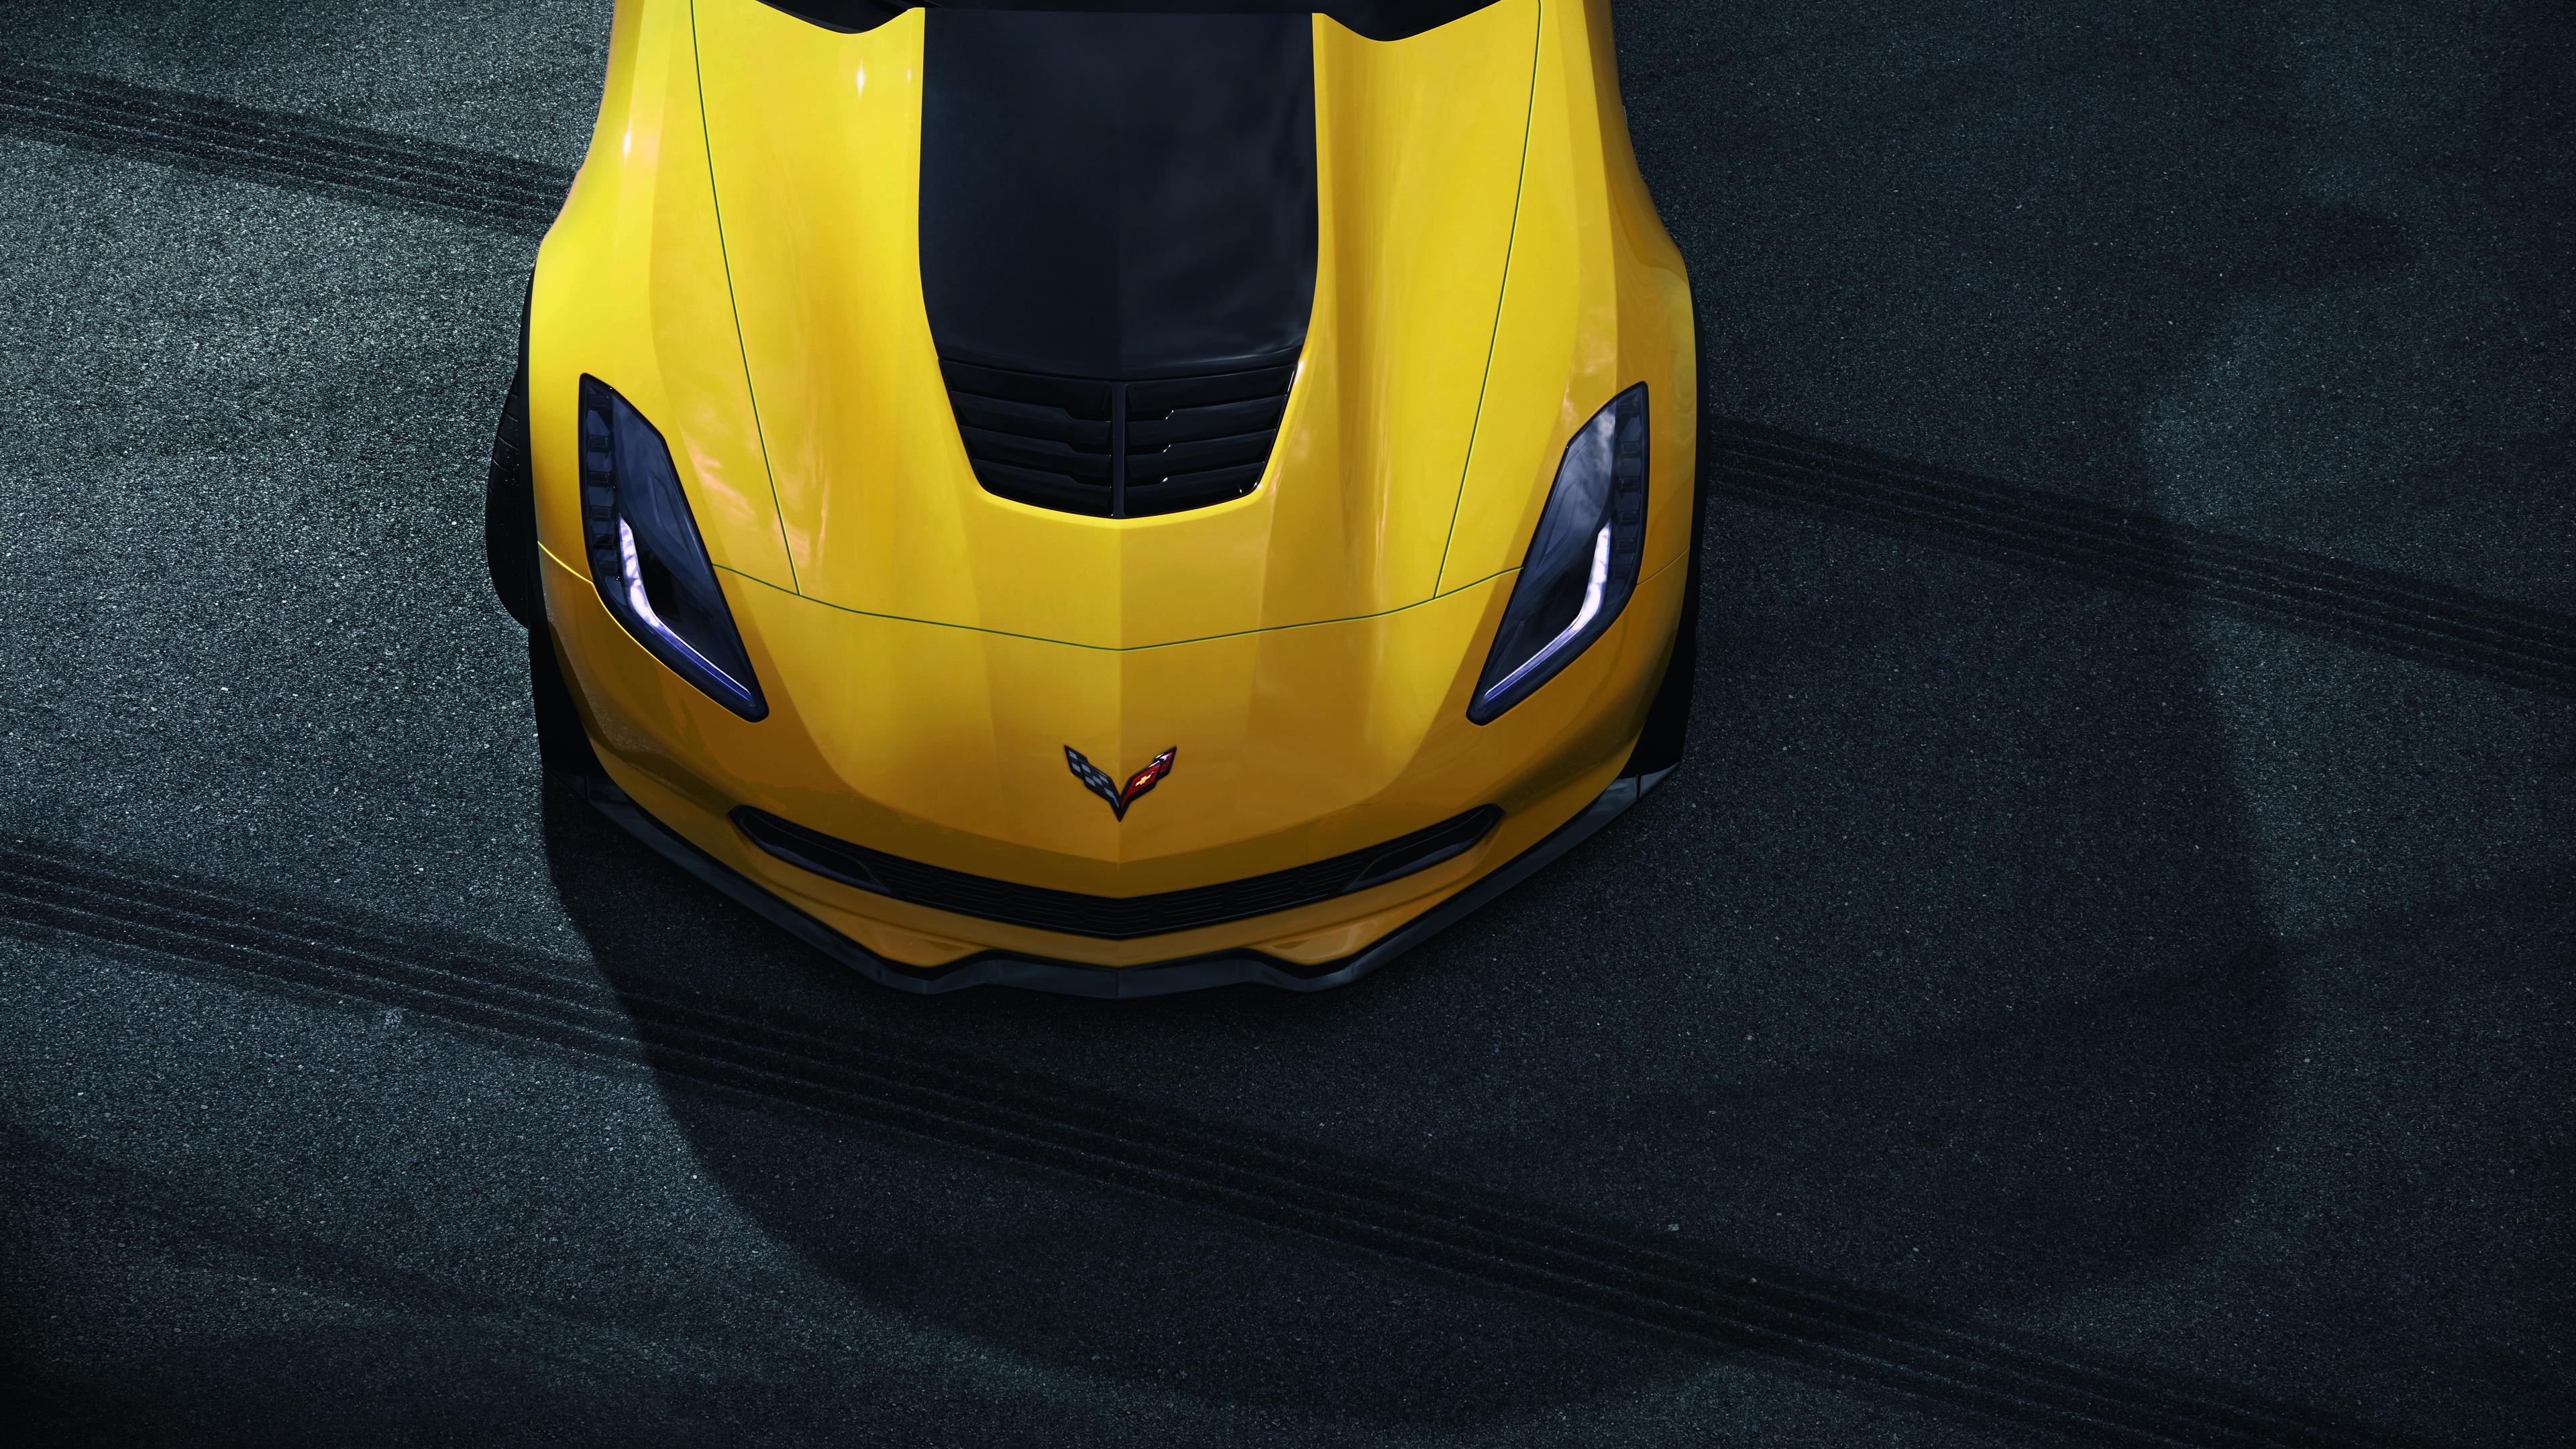 chevrolet corvette zr7 1560534082 - Chevrolet Corvette ZR7 - racing wallpapers, hd-wallpapers, corvette wallpapers, chevrolet wallpapers, cars wallpapers, 4k-wallpapers